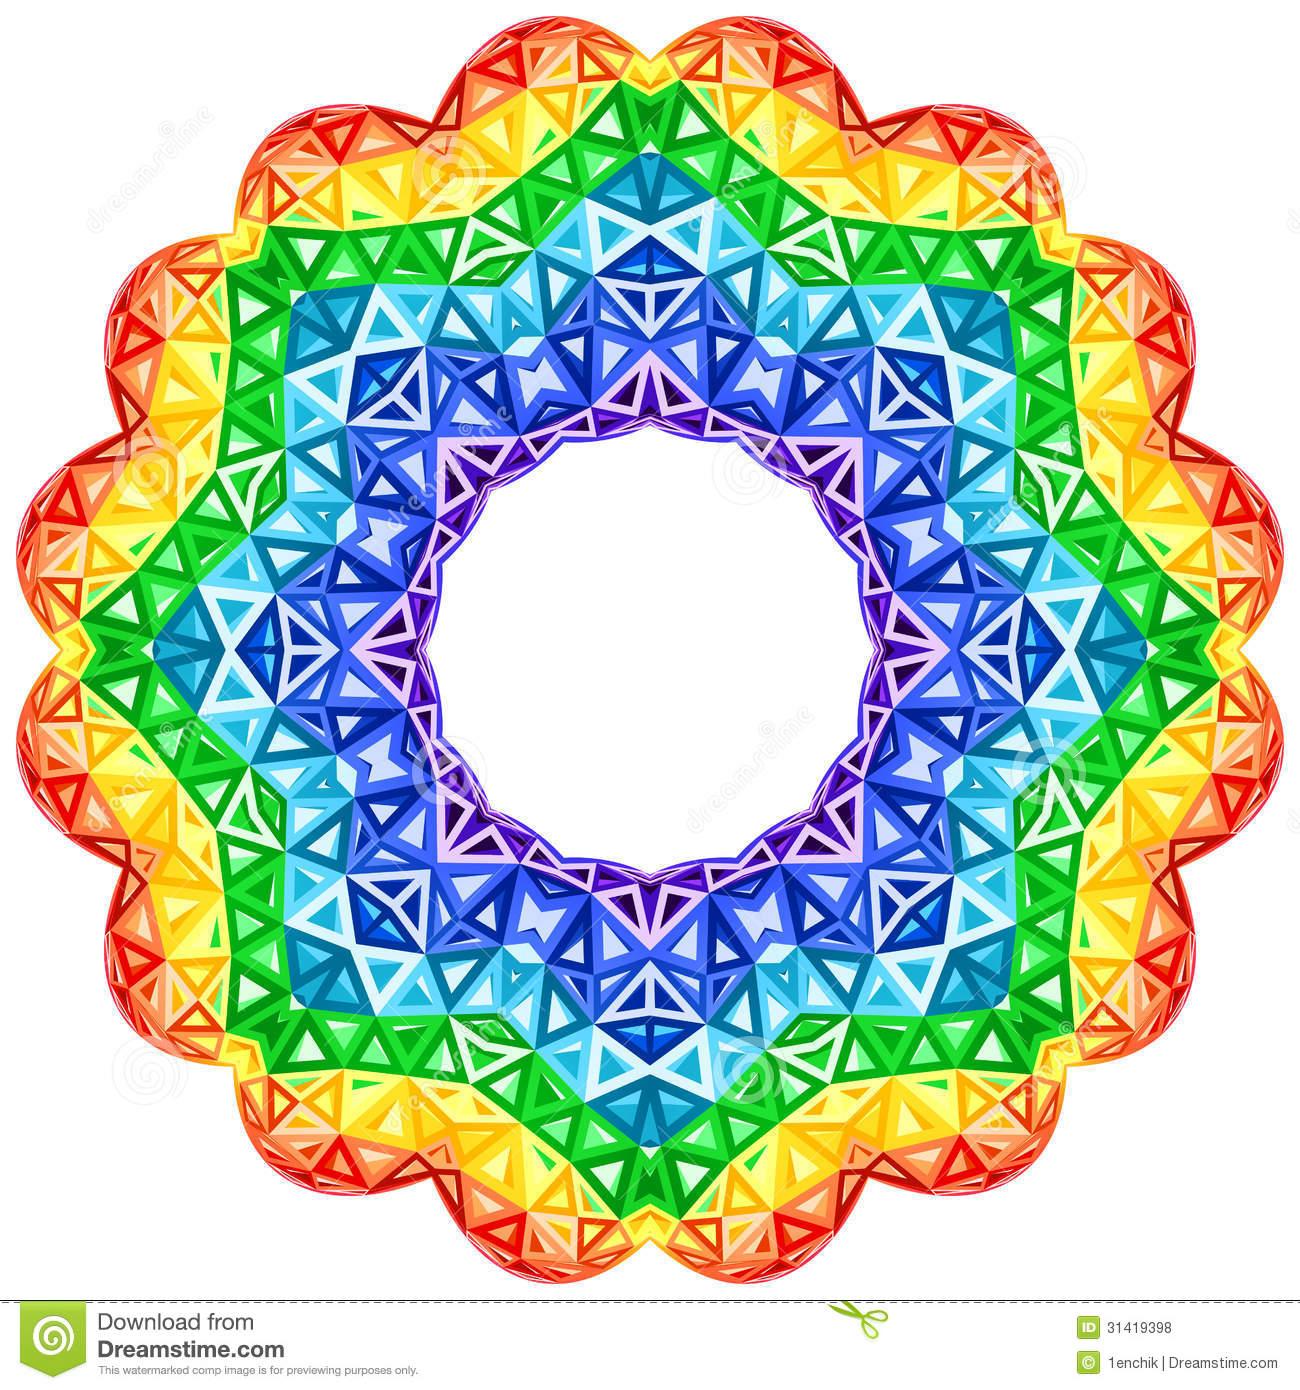 Kaleidoscope clip art.